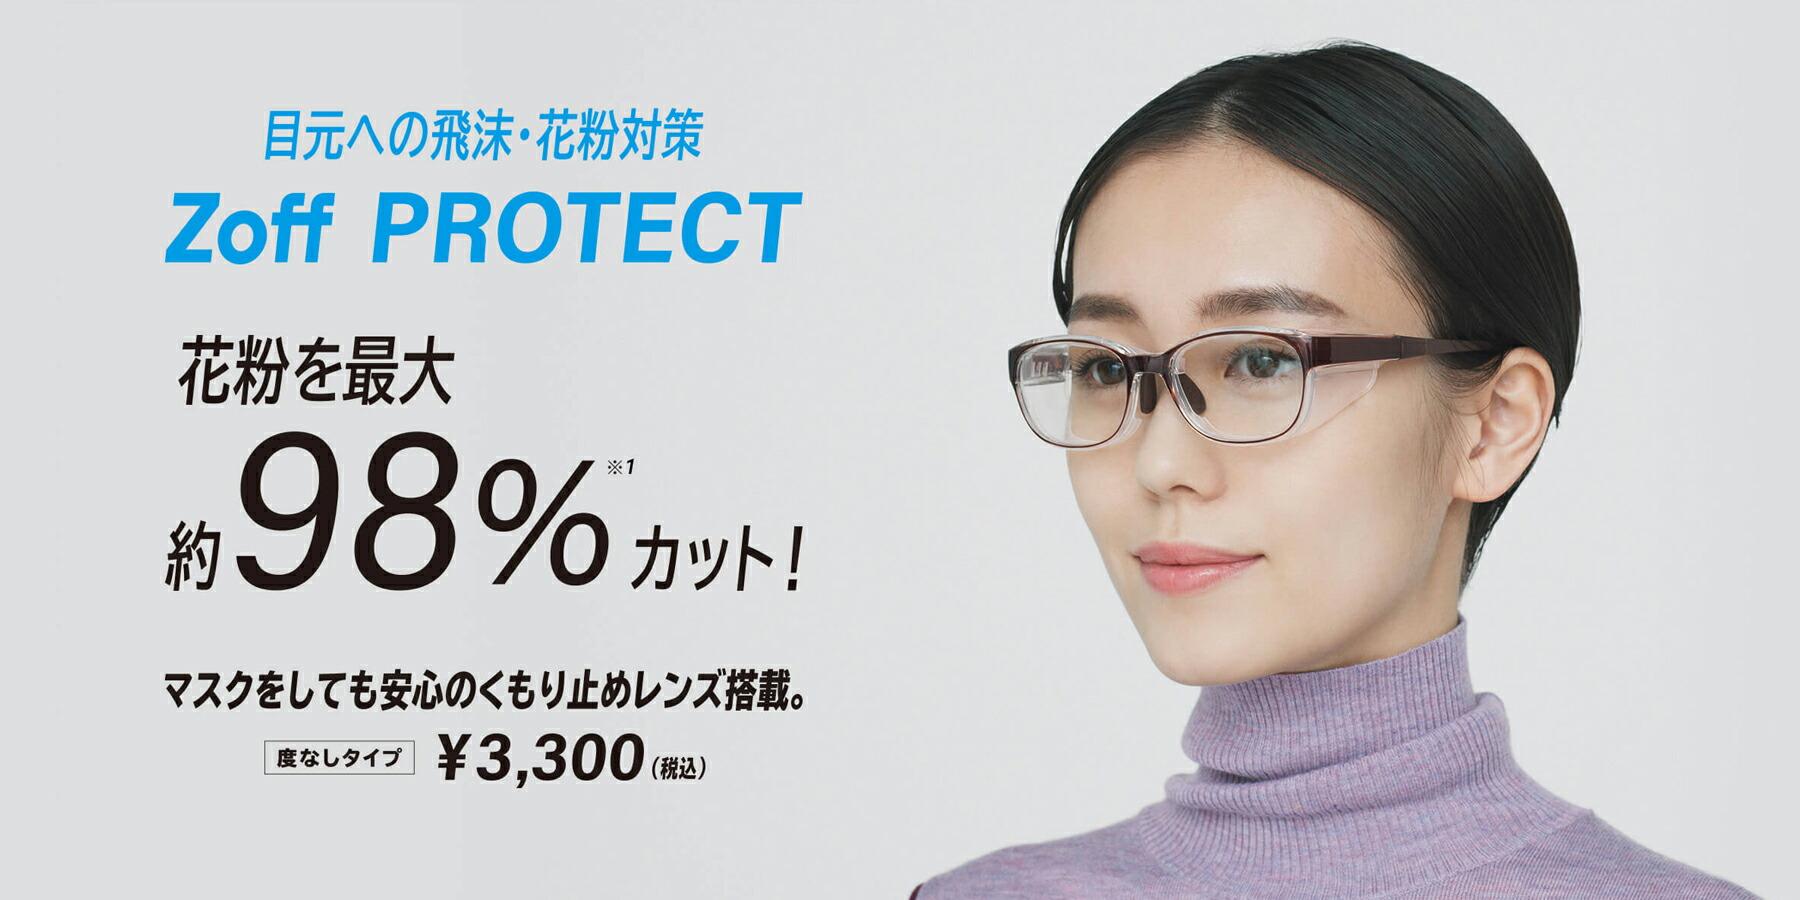 Zoff PROTECT